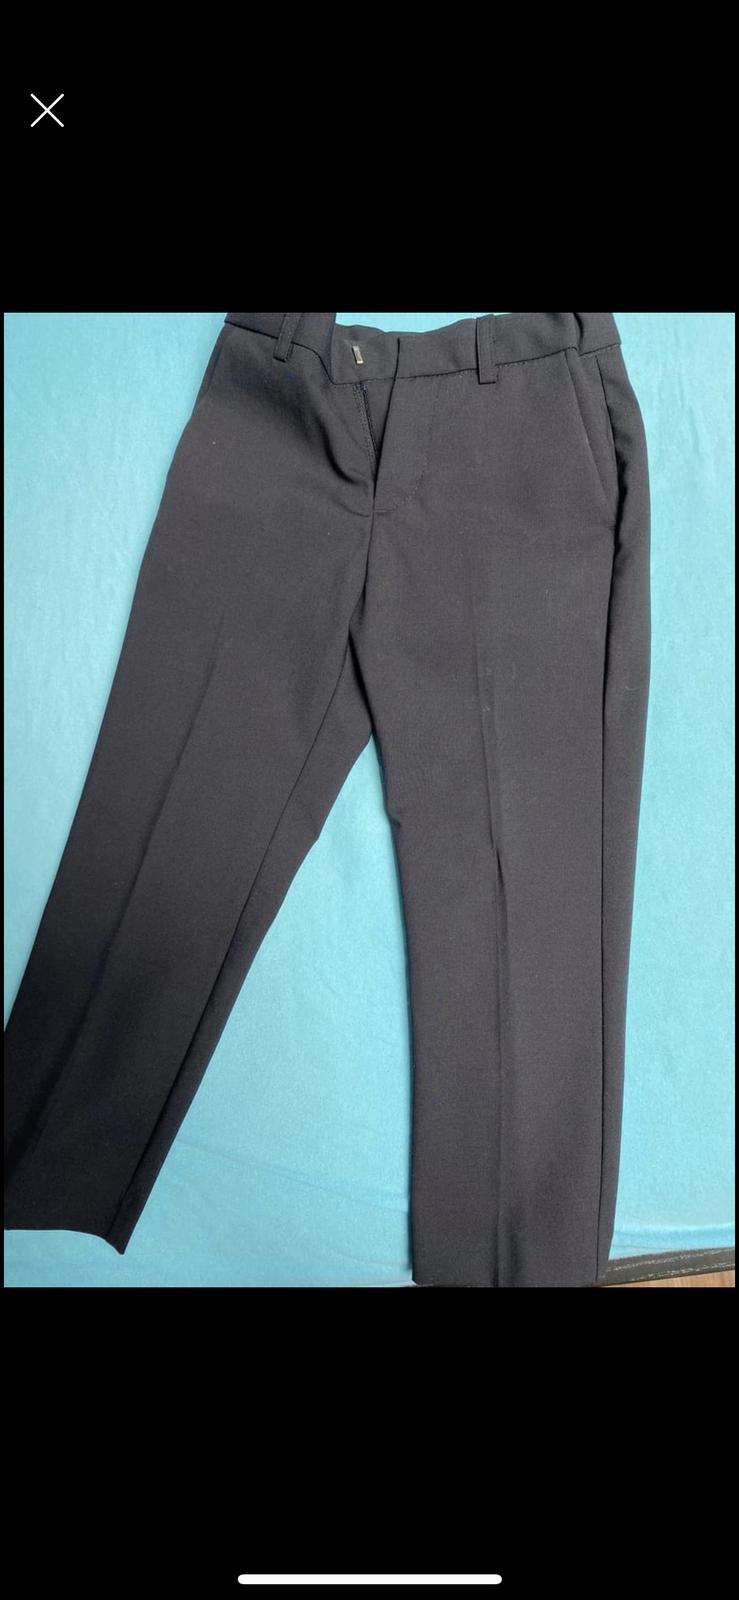 chlapecký oblek Zara - Obrázek č. 1